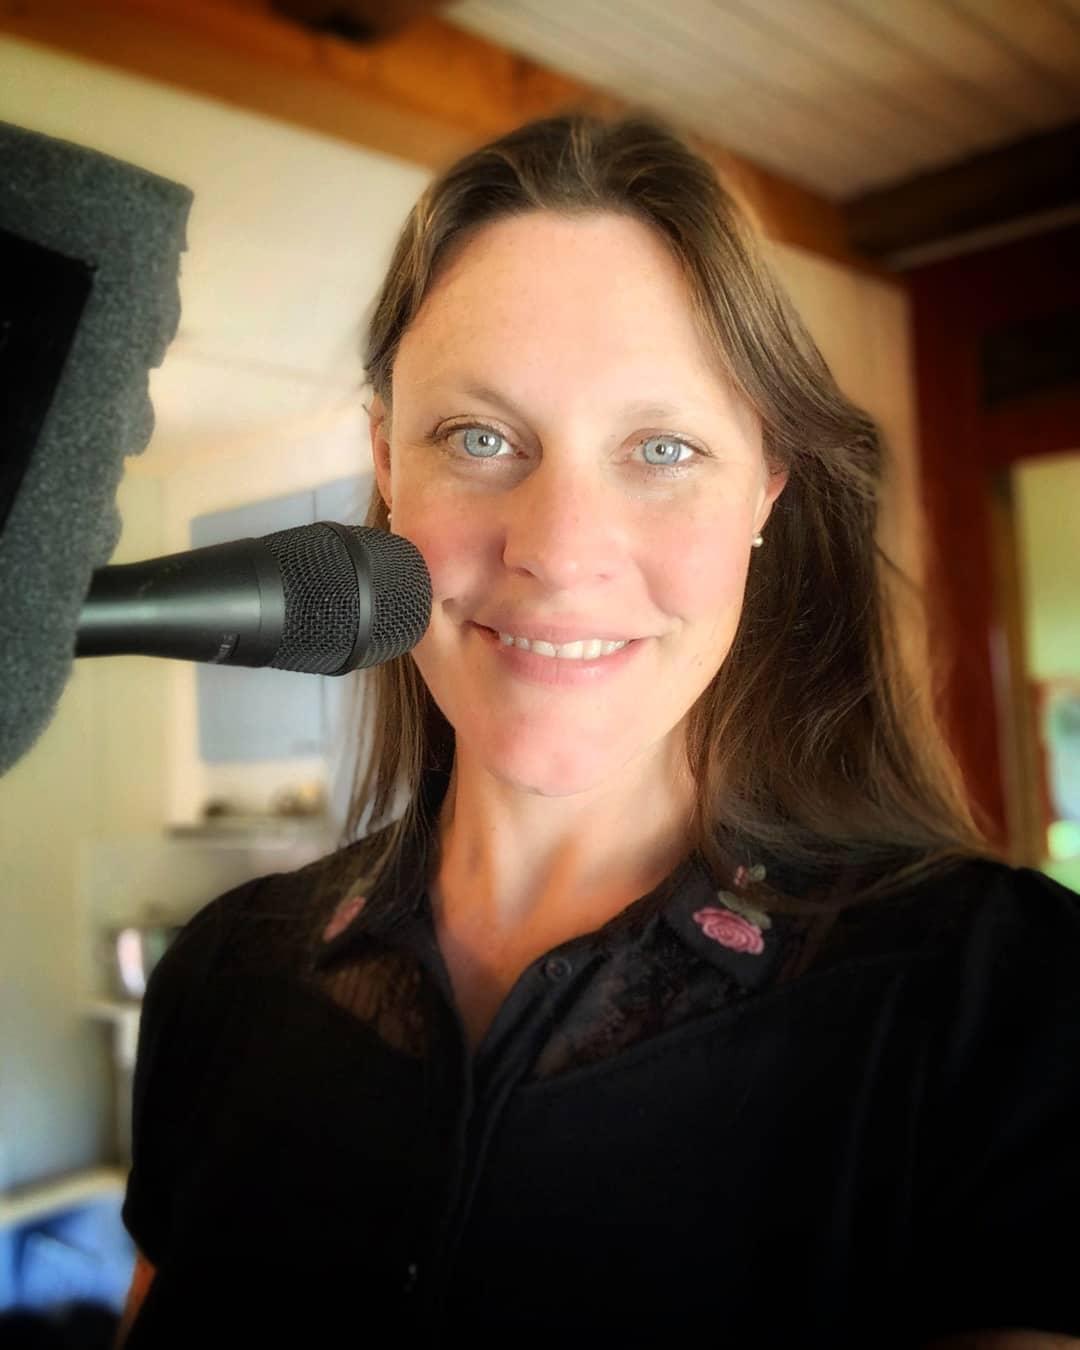 Floor Jansen rehearsing with Nightwish in studio